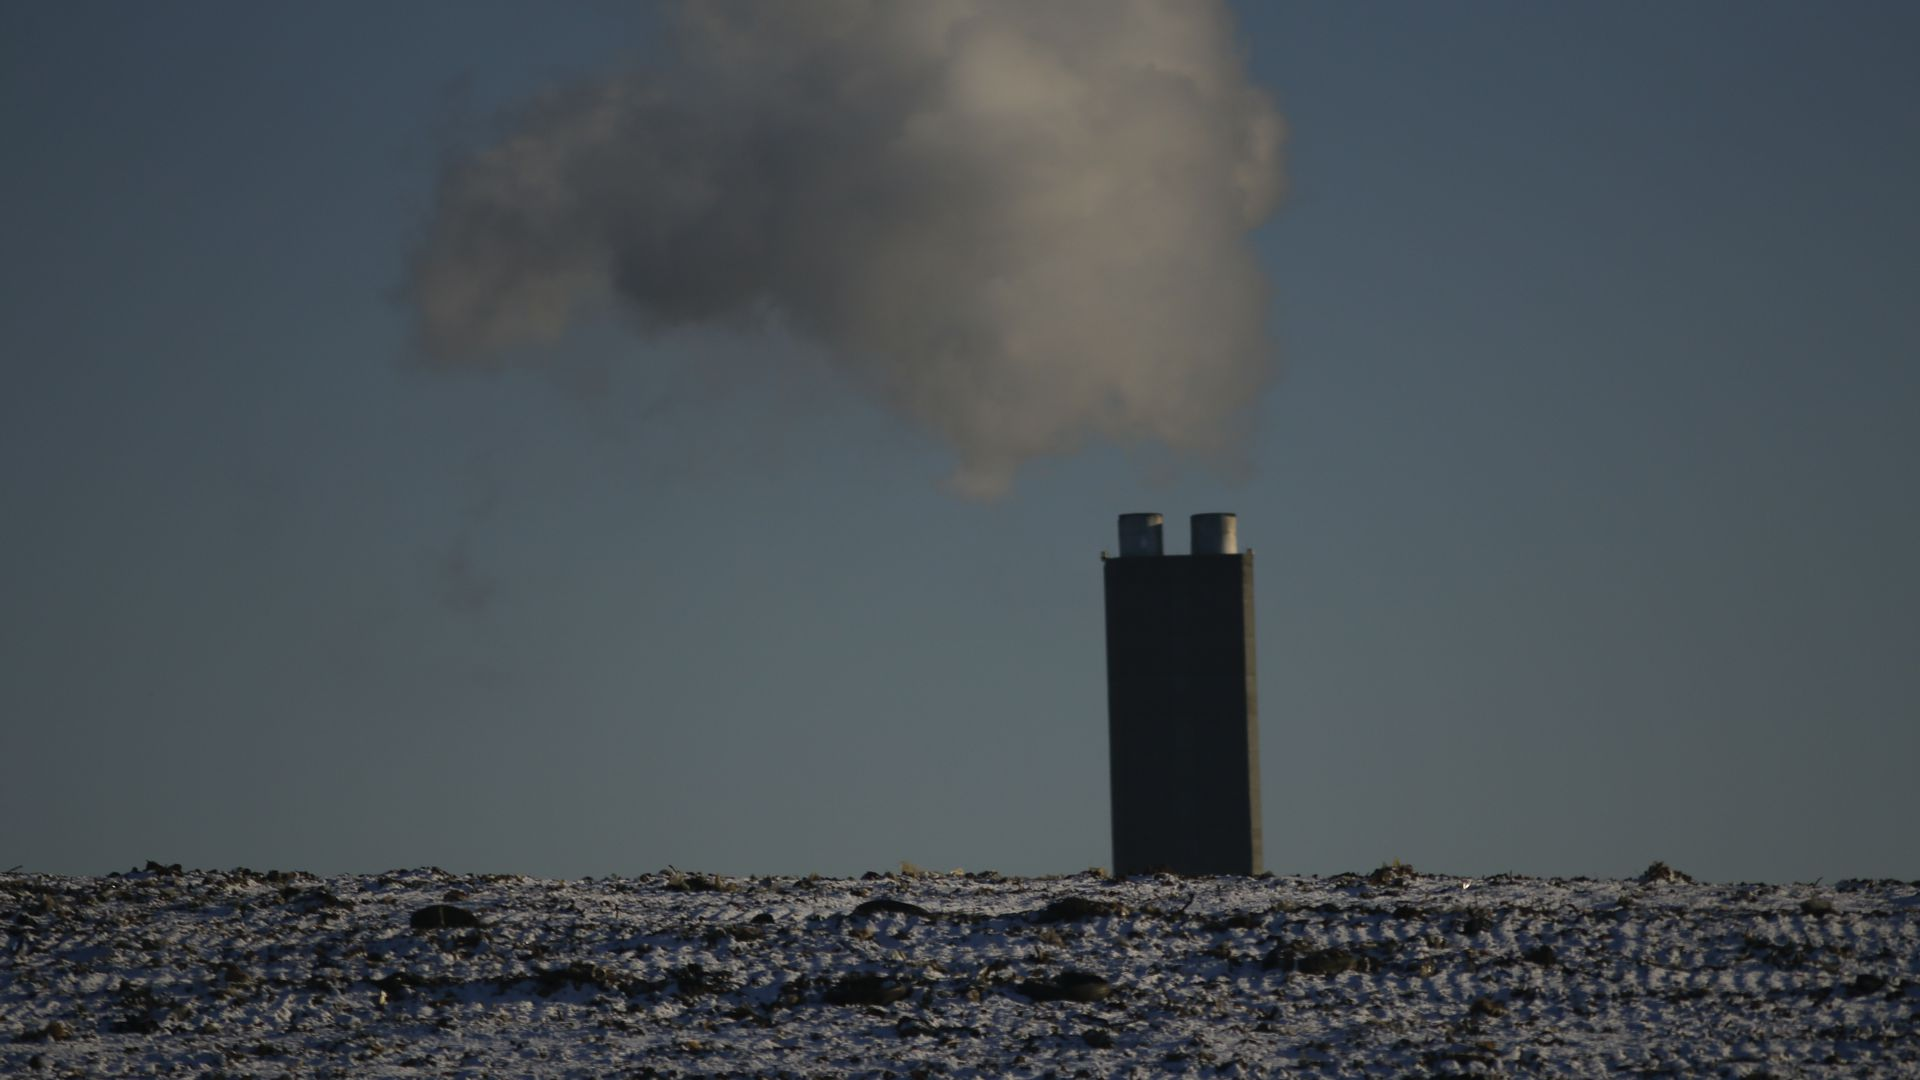 A factory emits smoke